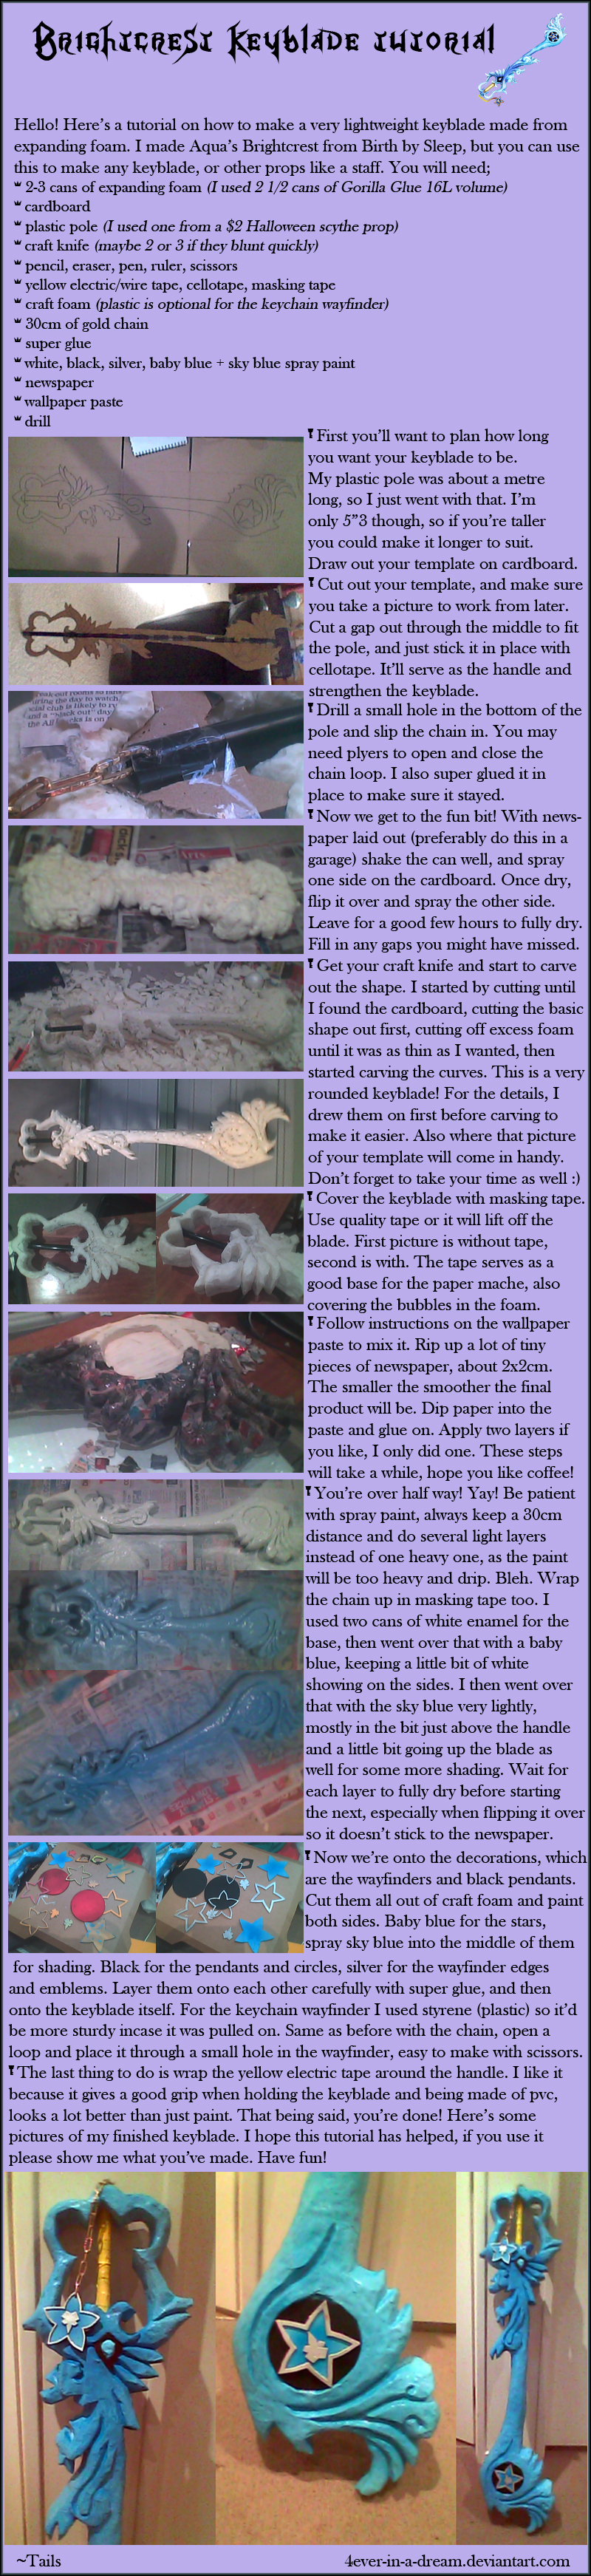 Brightcrest keyblade Tutorial by Fairie-Tails